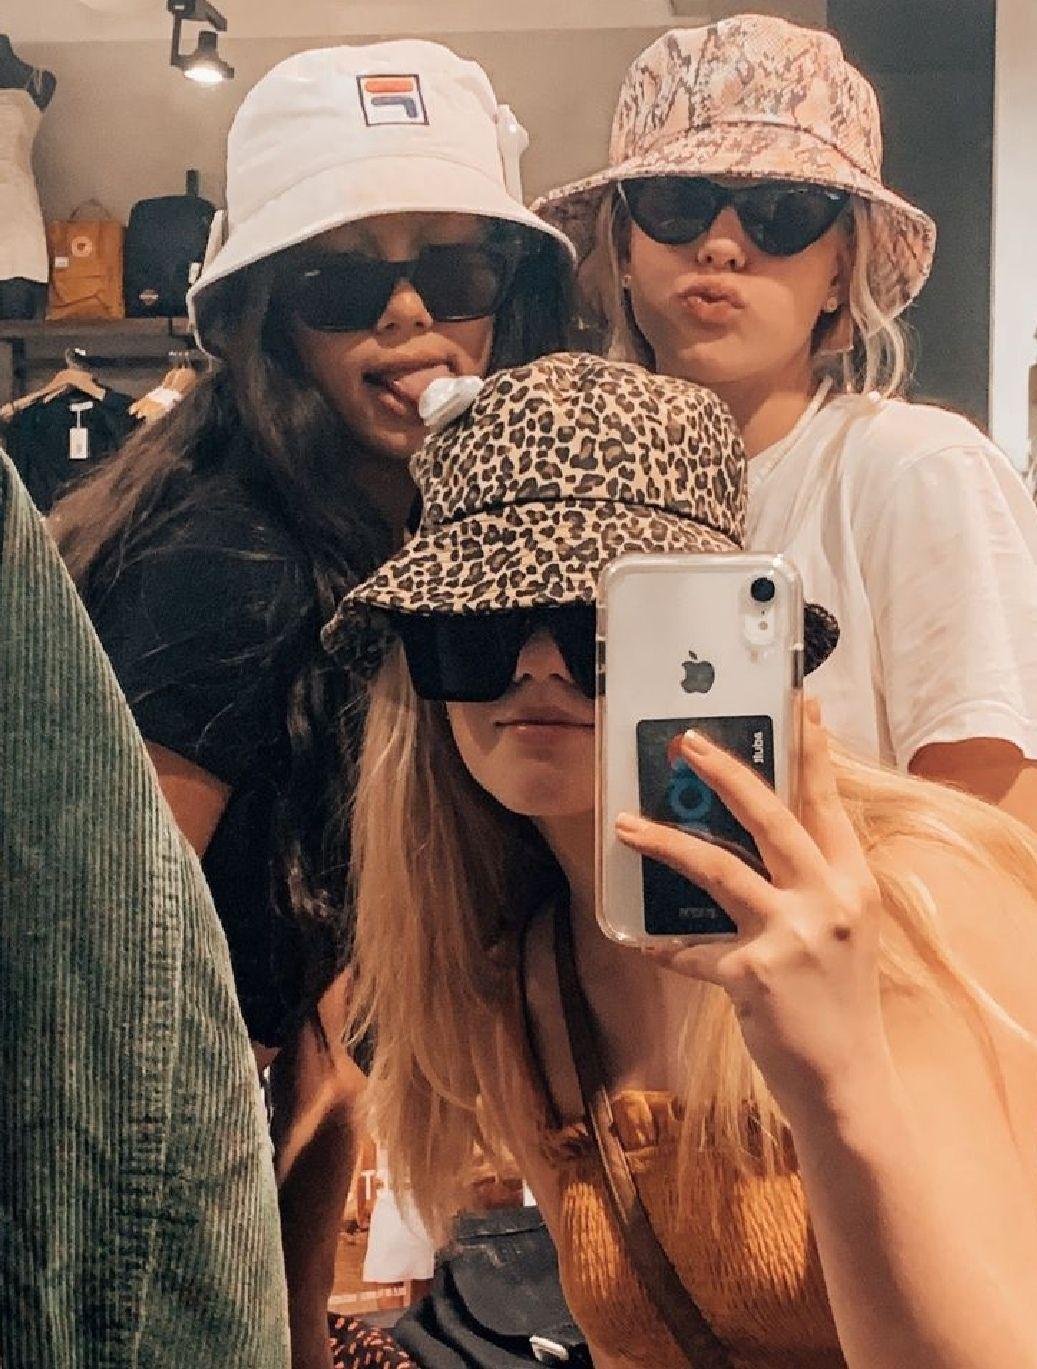 Instagram Tik Tok Friend Photoshoot Friend Poses Friends Photography